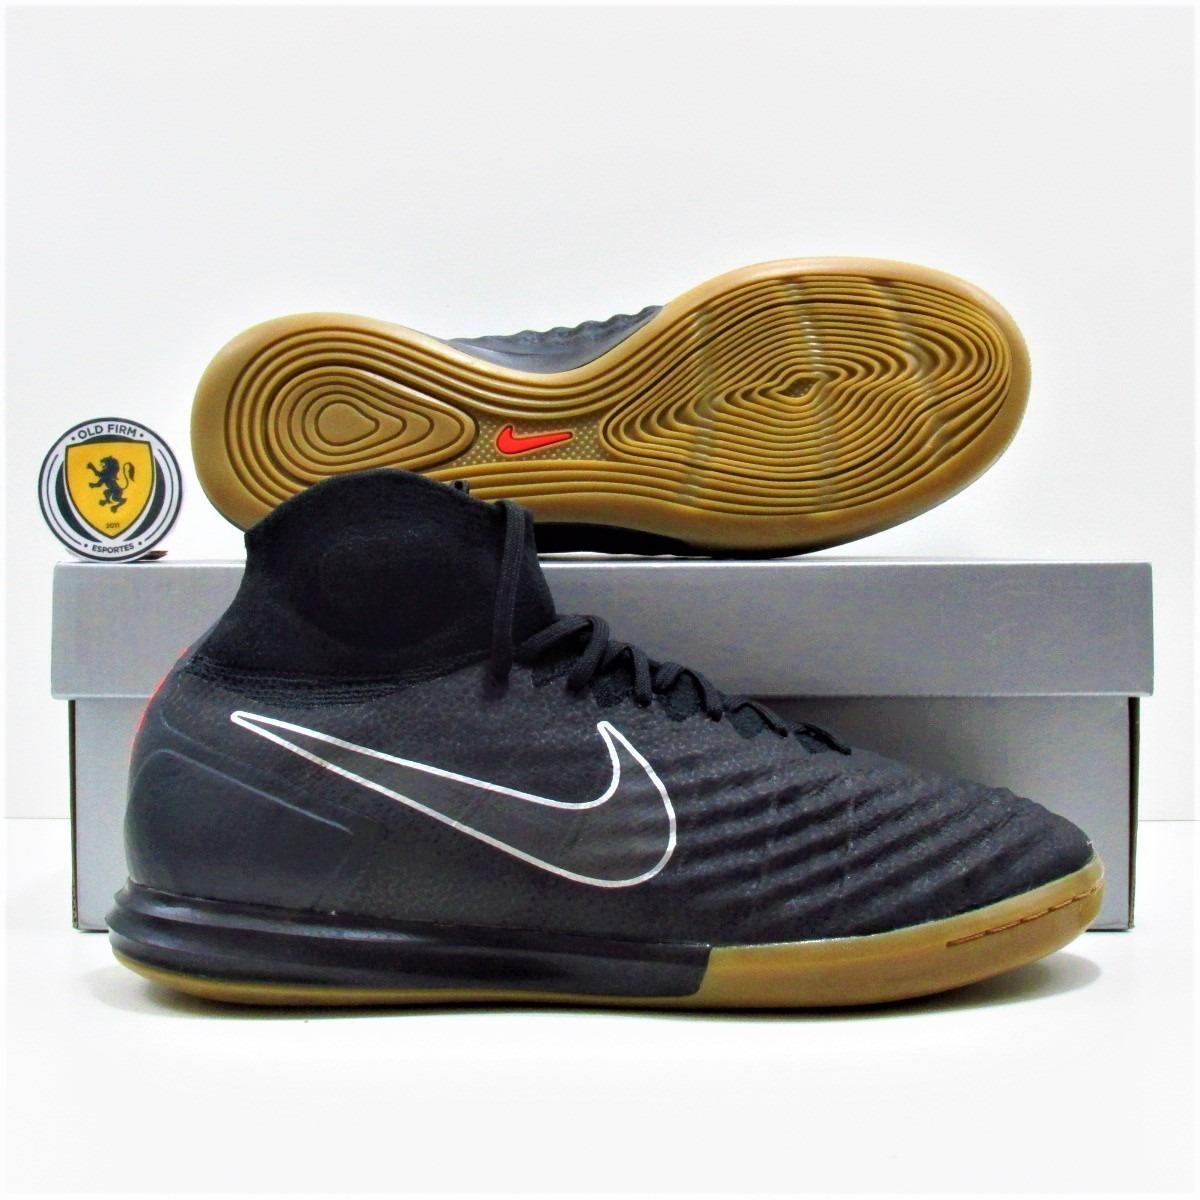 Tenis Chuteira Futsal Nike Magistax Proximo Original - R  449 e7148cb5f4aaf